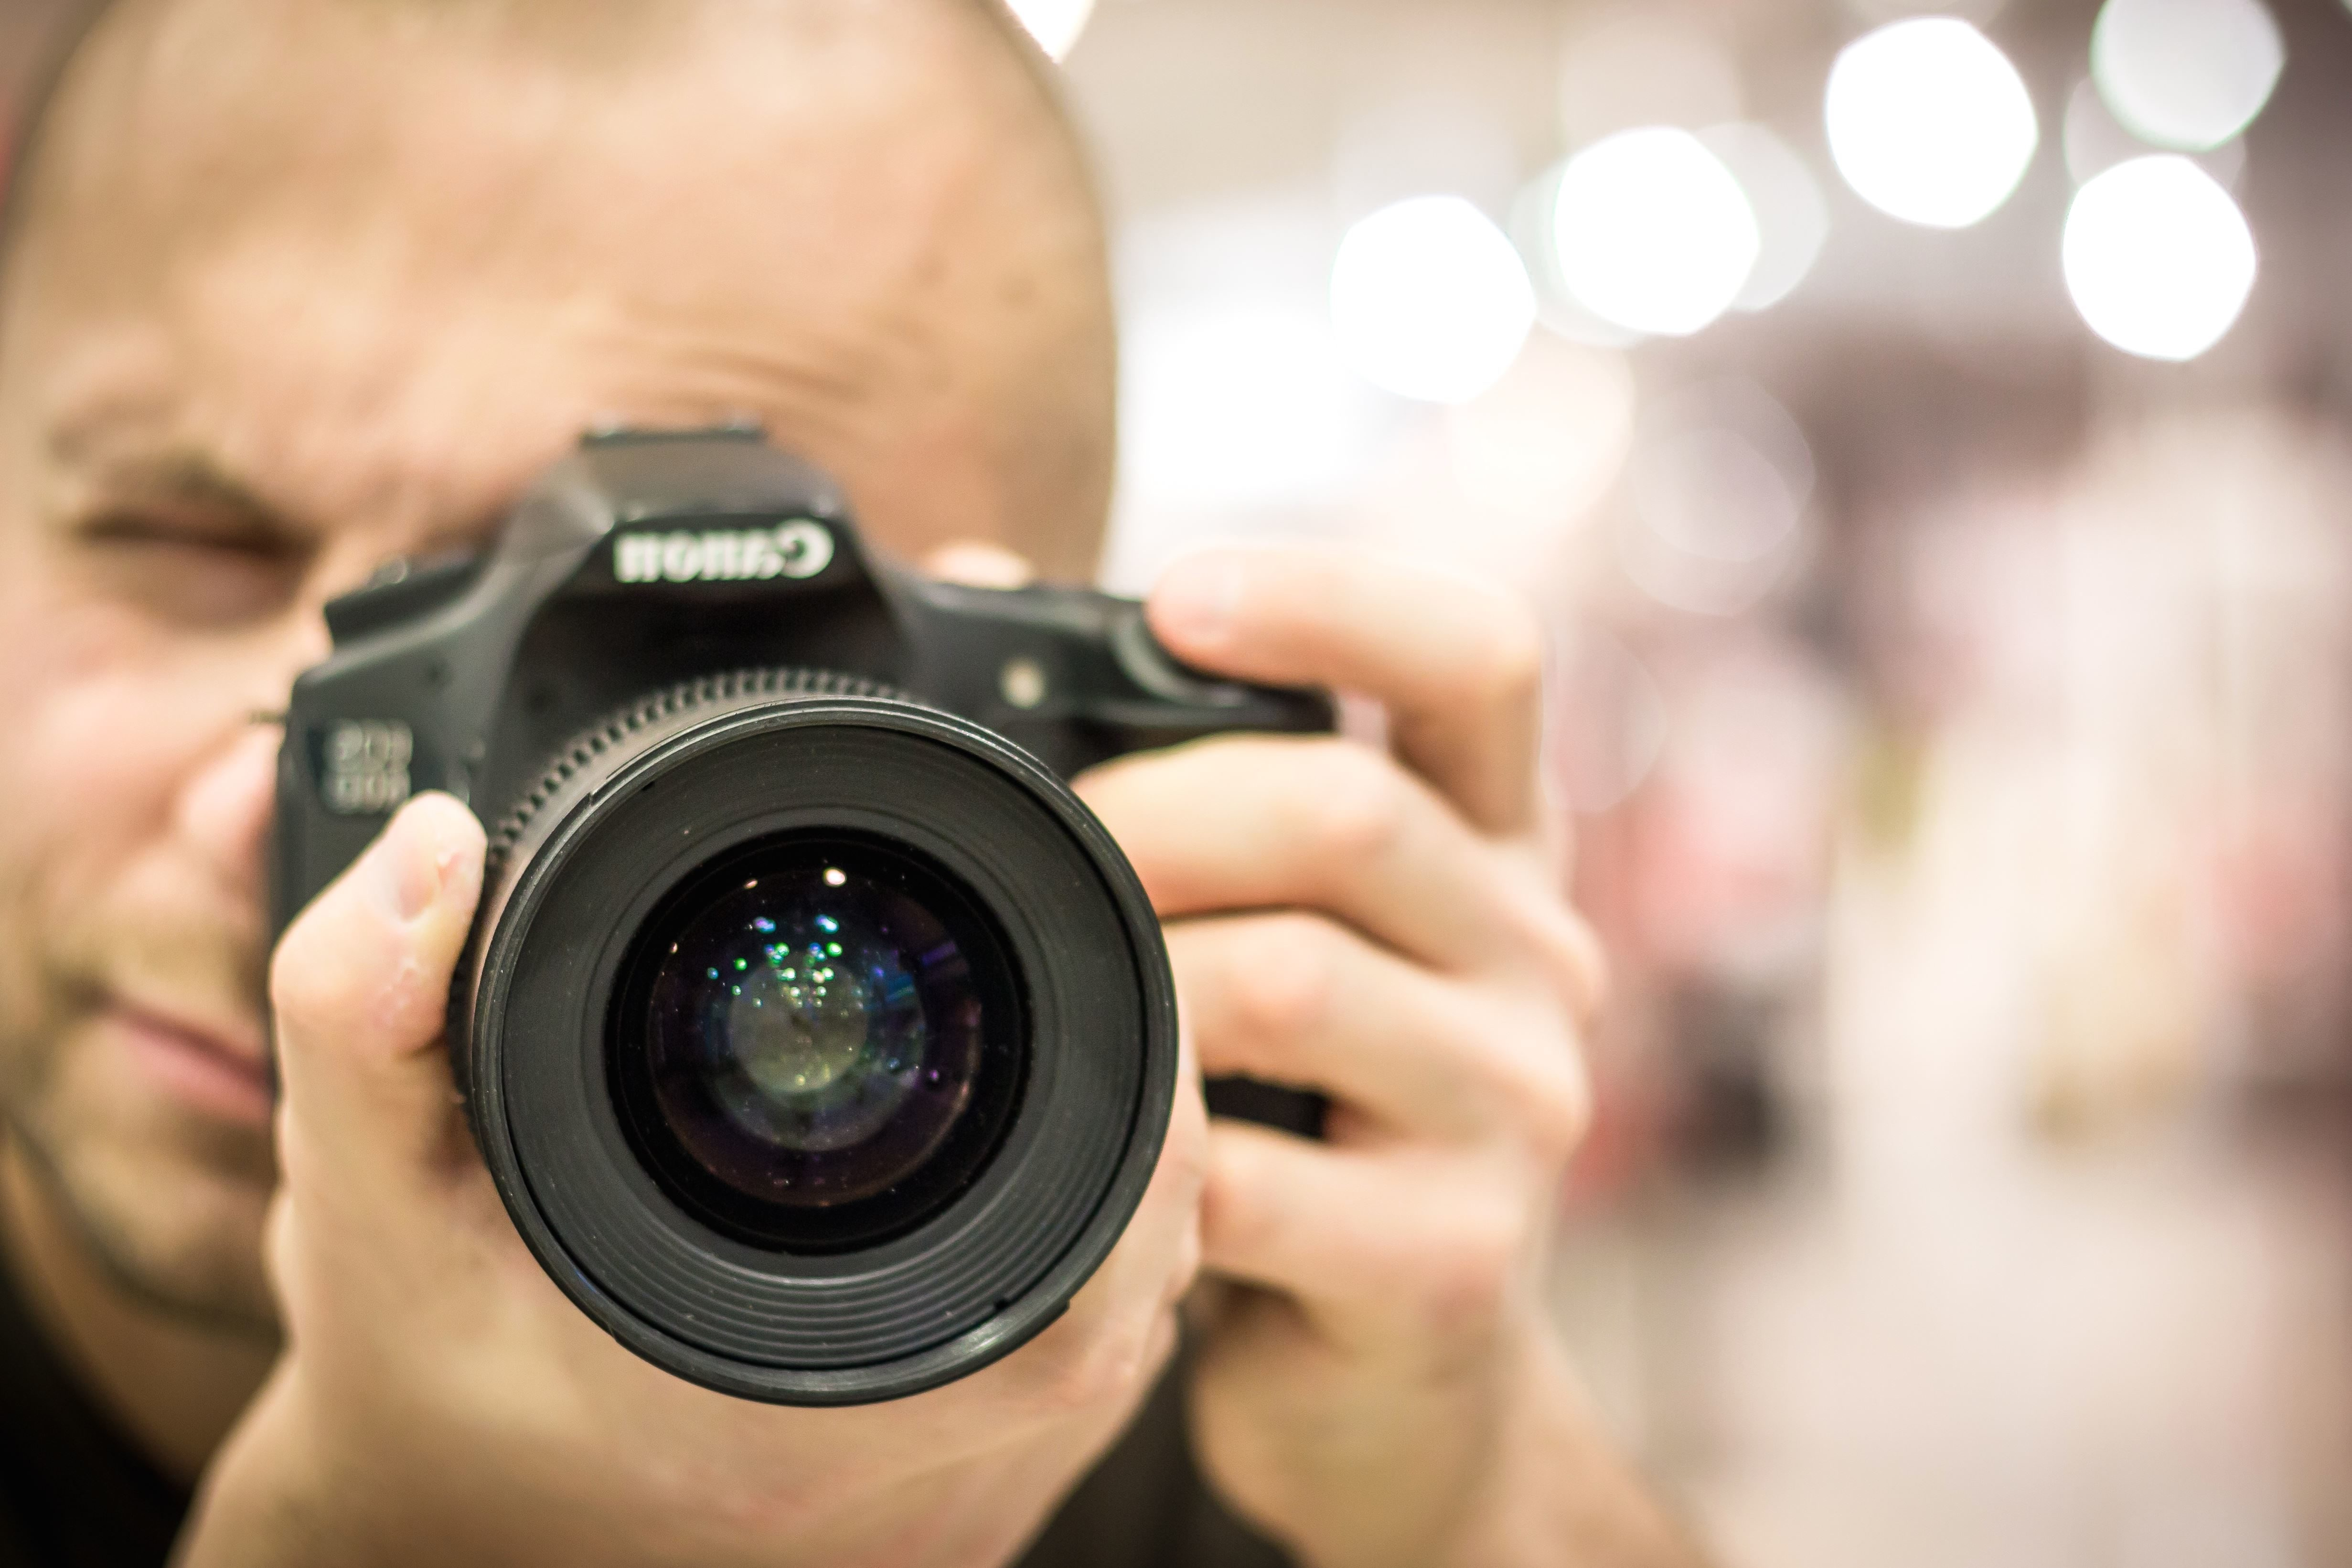 Black veil brides ap photo shoot Novotel Jaragu - Book your hotel in S o Paulo